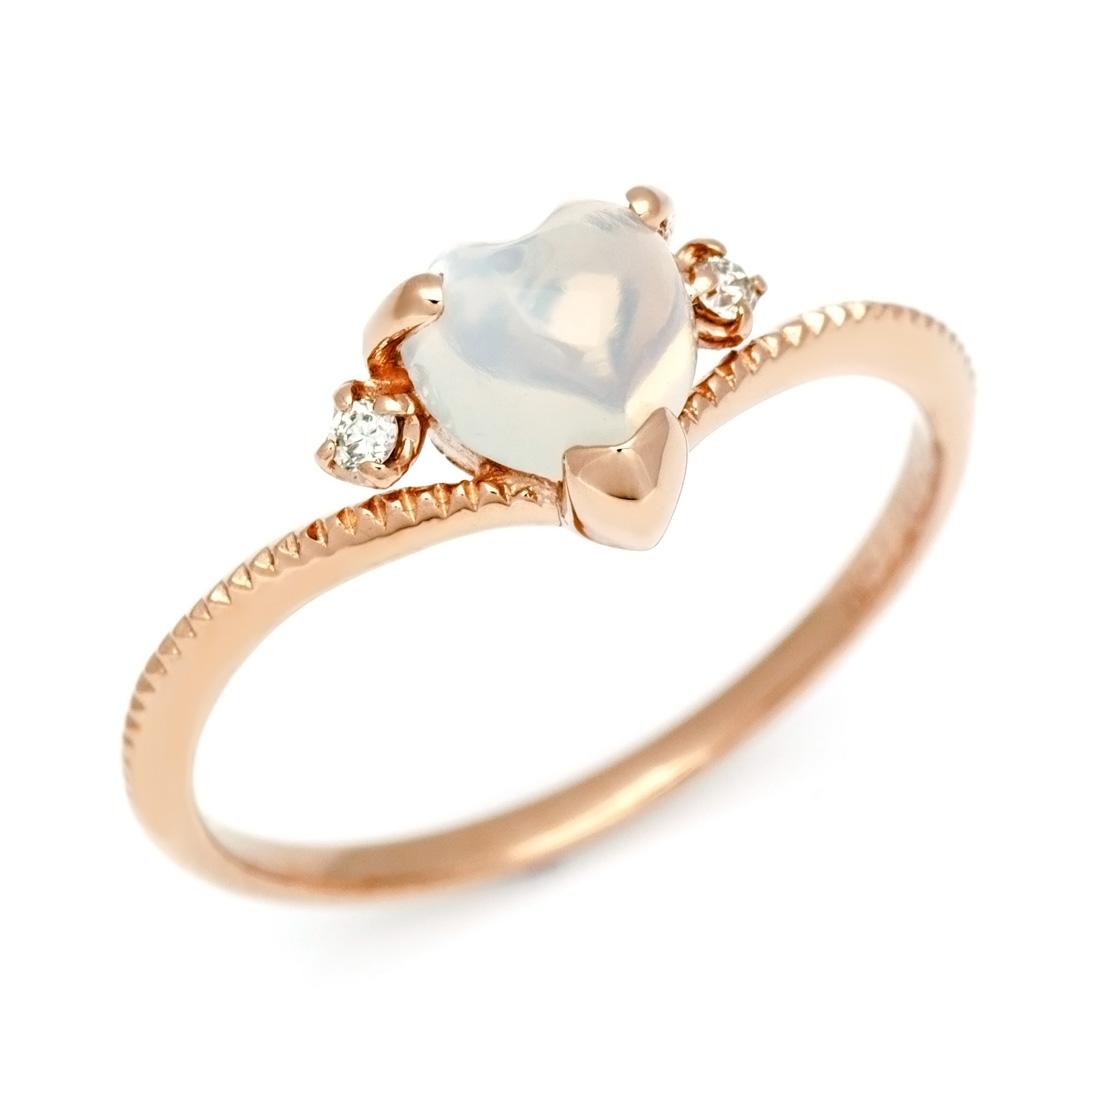 K18 ブルームーンストーン ダイヤモンド ハートリング 「ragazza」 指輪 ゴールド 18K 18金 ダイアモンド 誕生日 6月誕生石 刻印 文字入れ メッセージ ギフト 贈り物 ピンキーリング対応可能